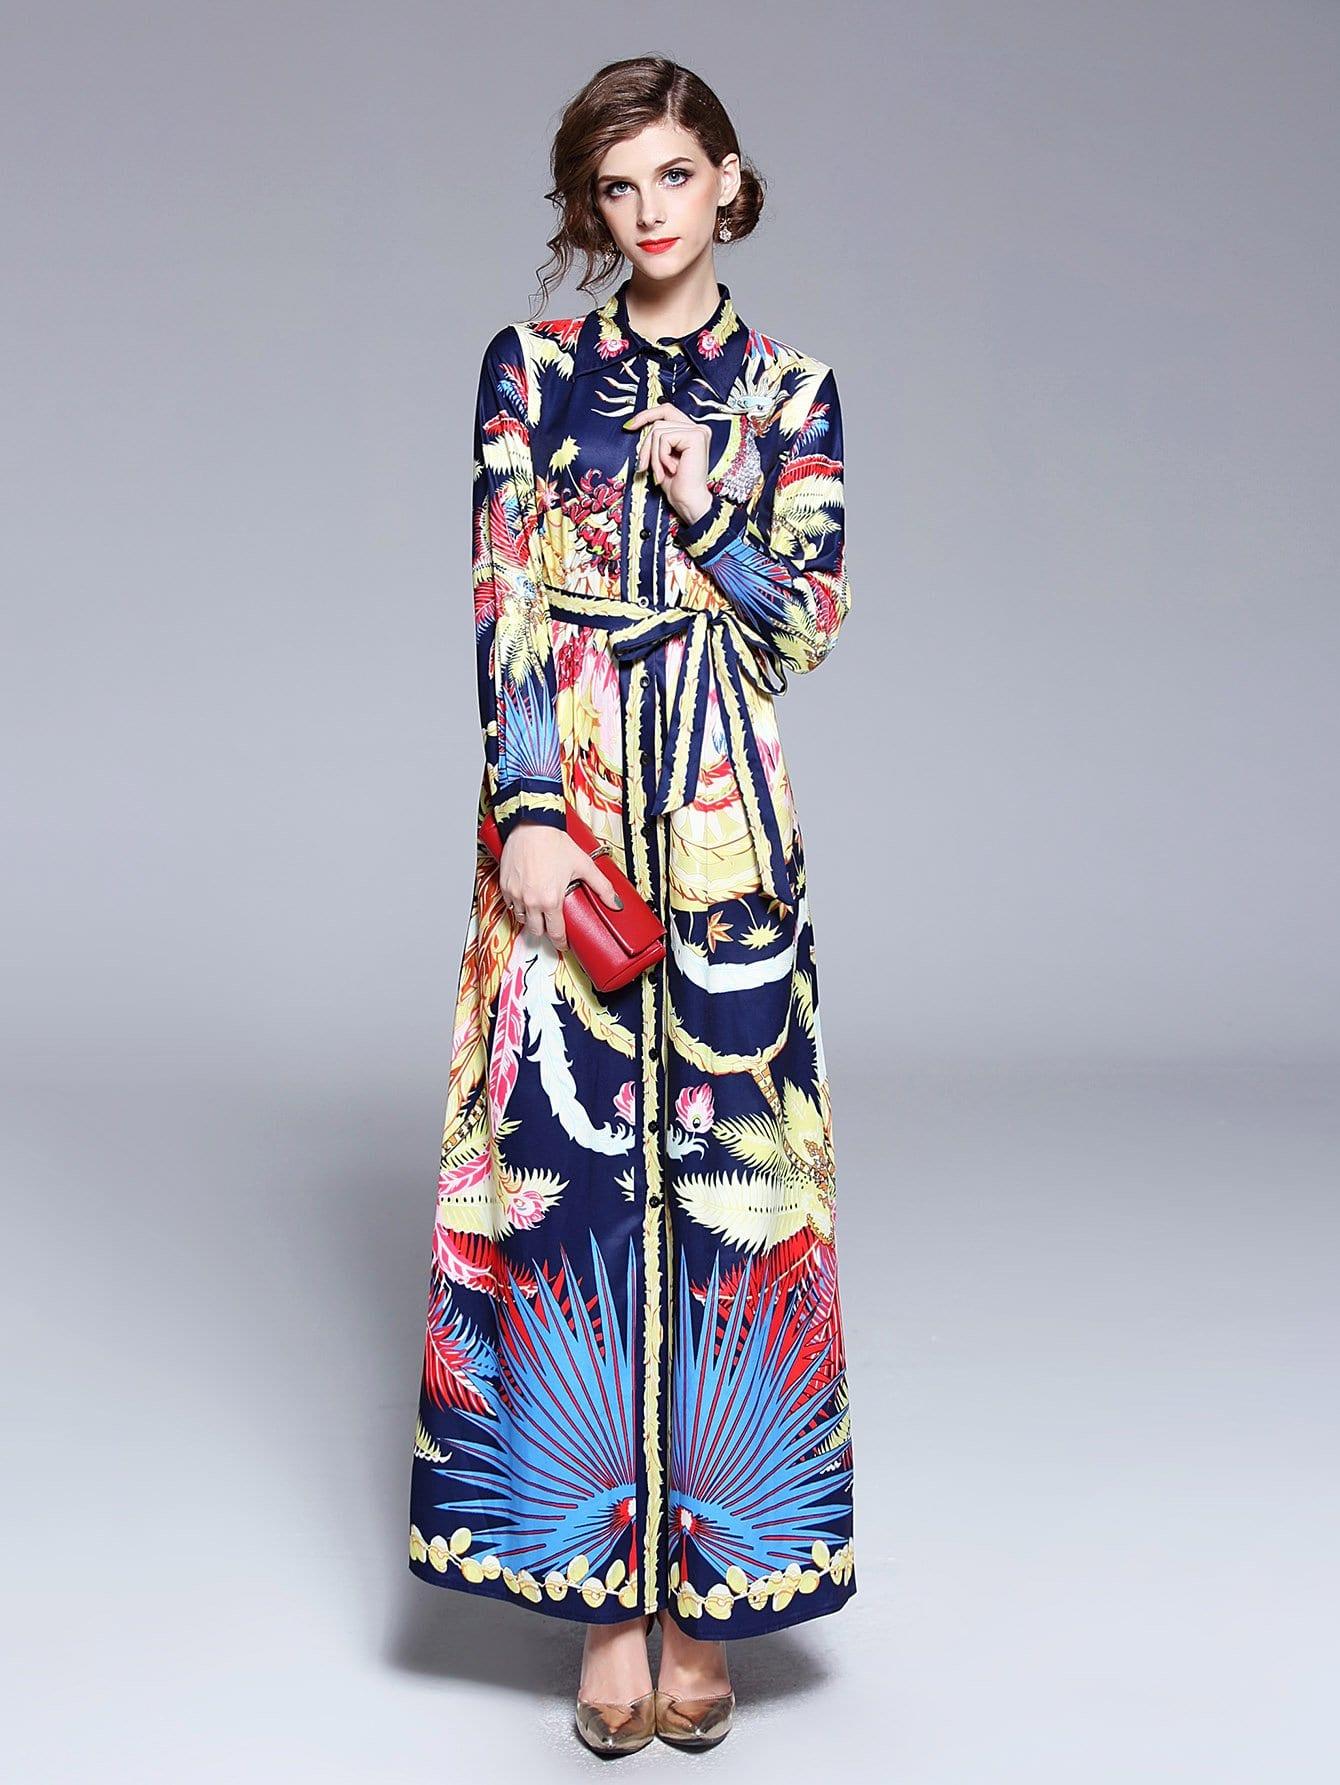 Graphic Print Tie Waist Longline Shirt Dress flower print tie waist shirt dress